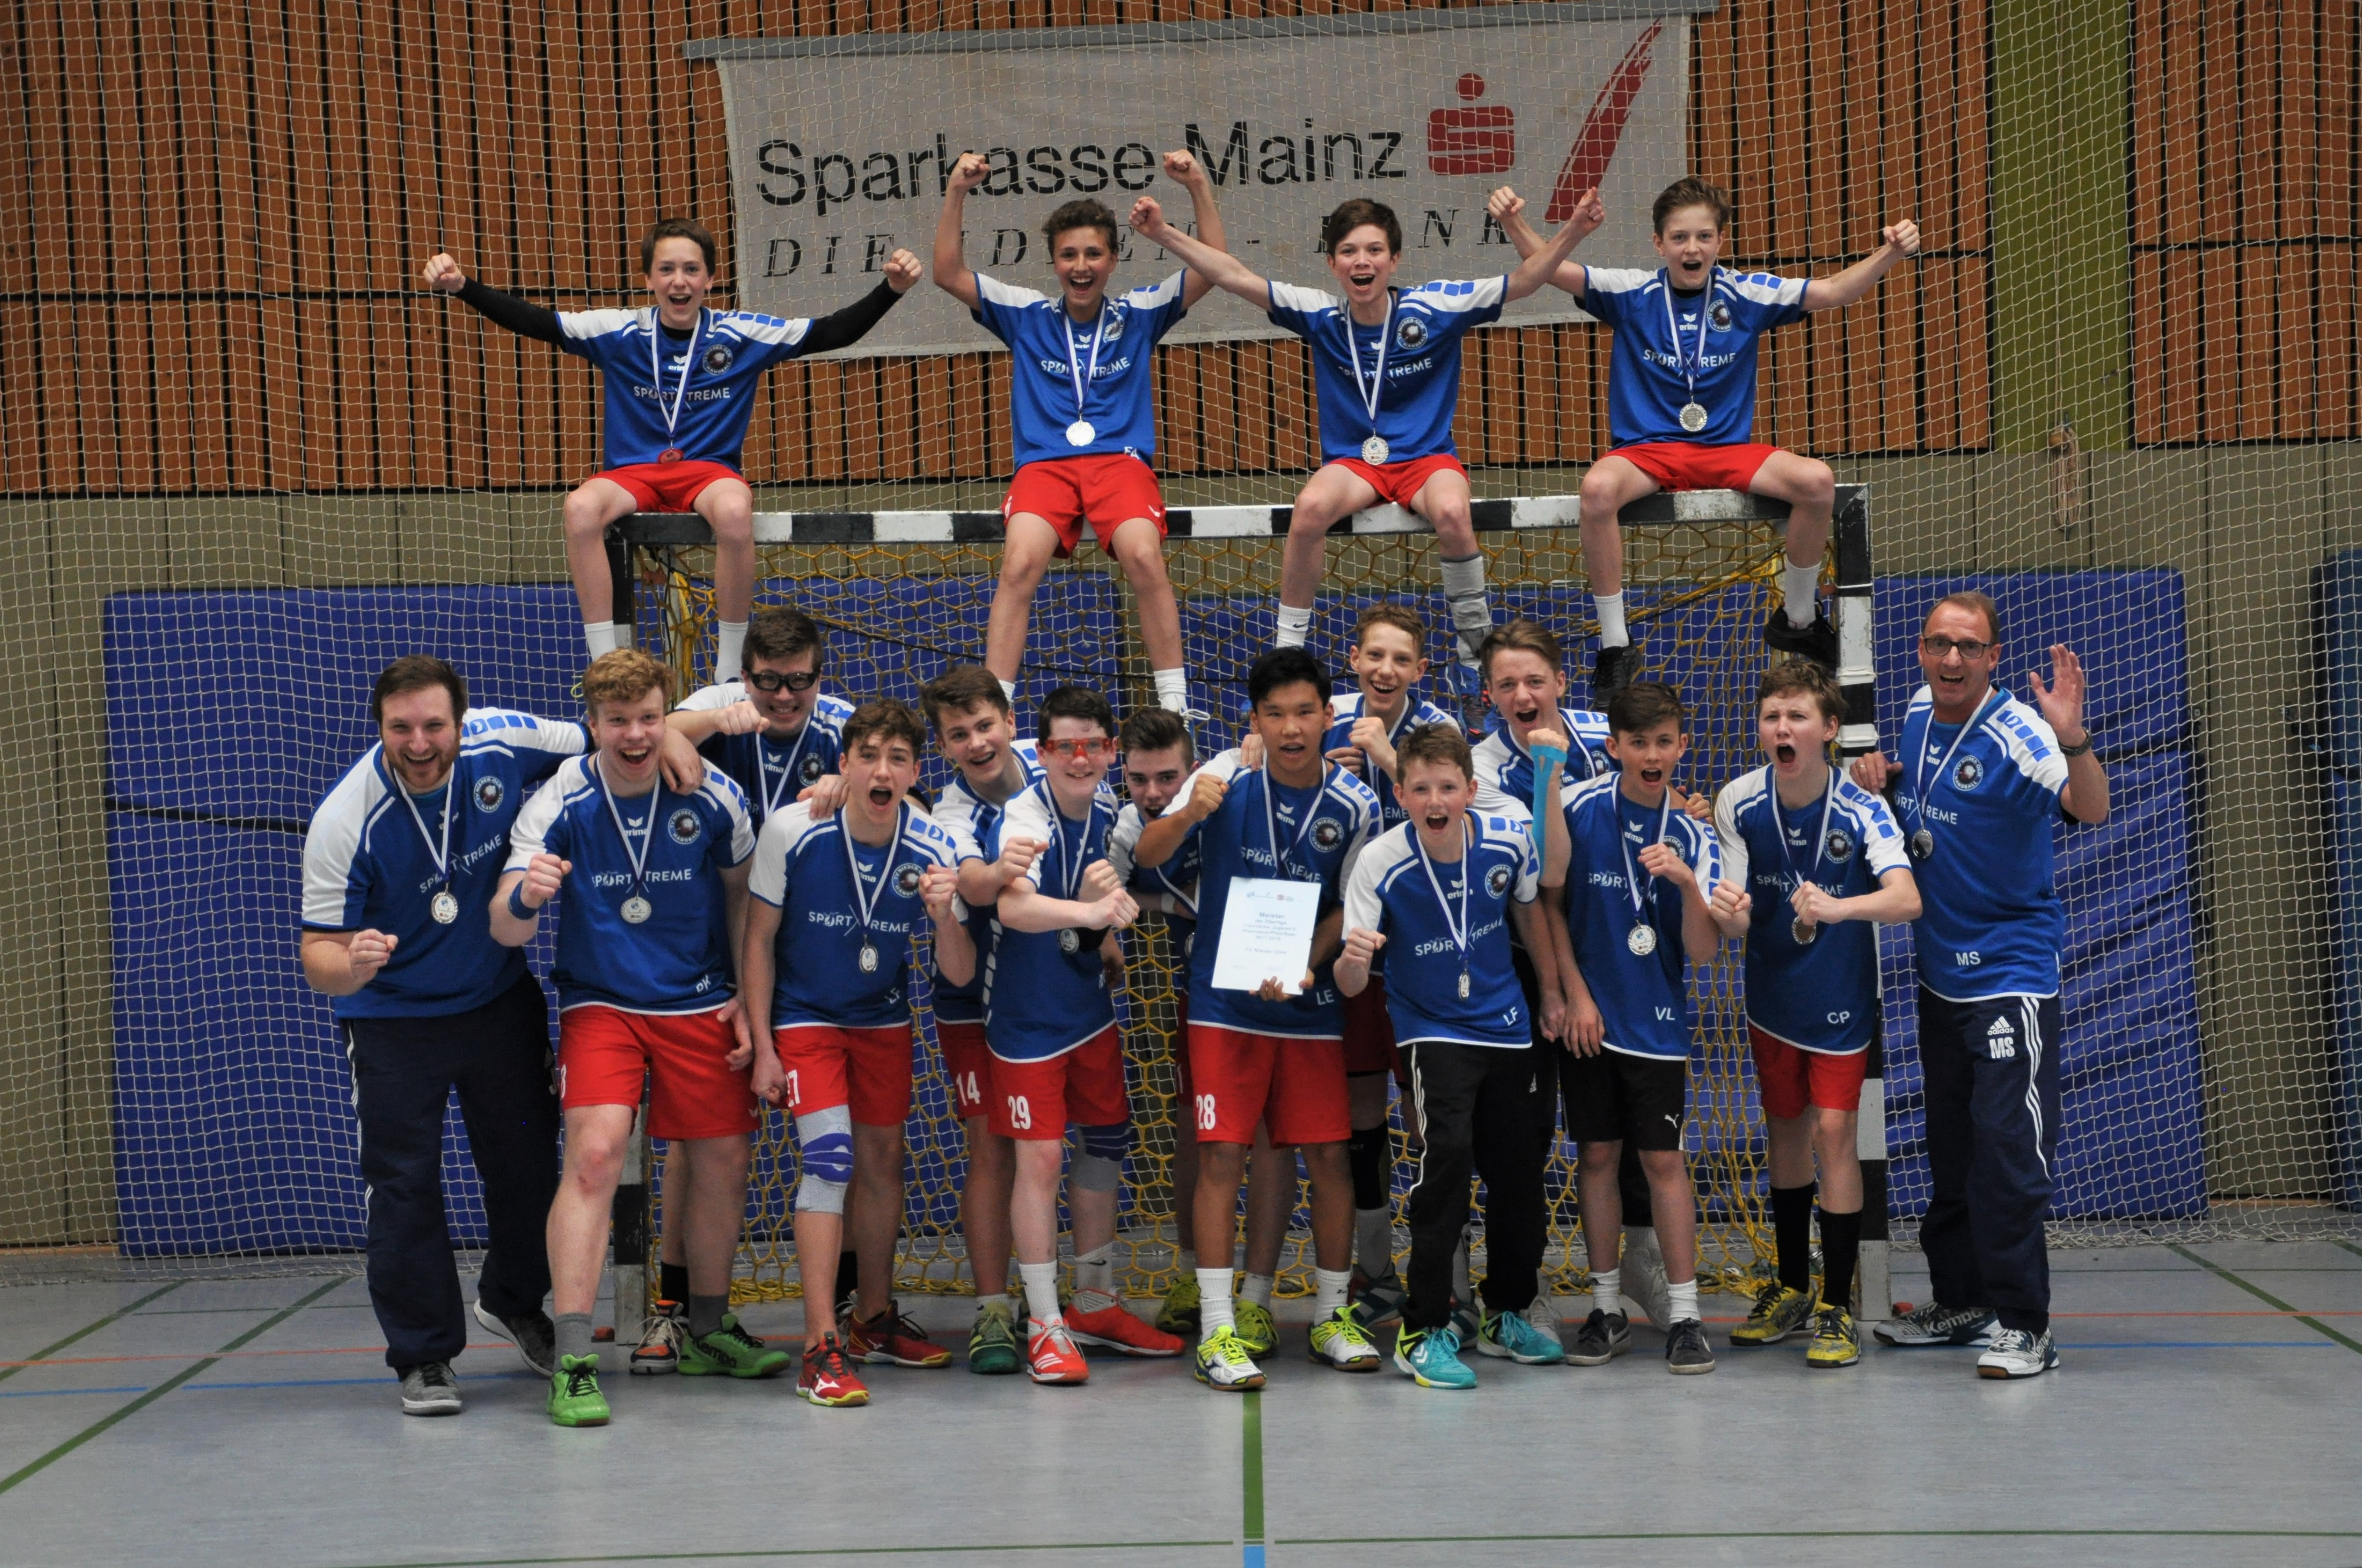 Meisterschaftsehrung nach klarem Sieg! Männl. C-Jugend Oberliga RPS: TV Nieder-Olm – JSG Hunsrück 34:24 (21:12)